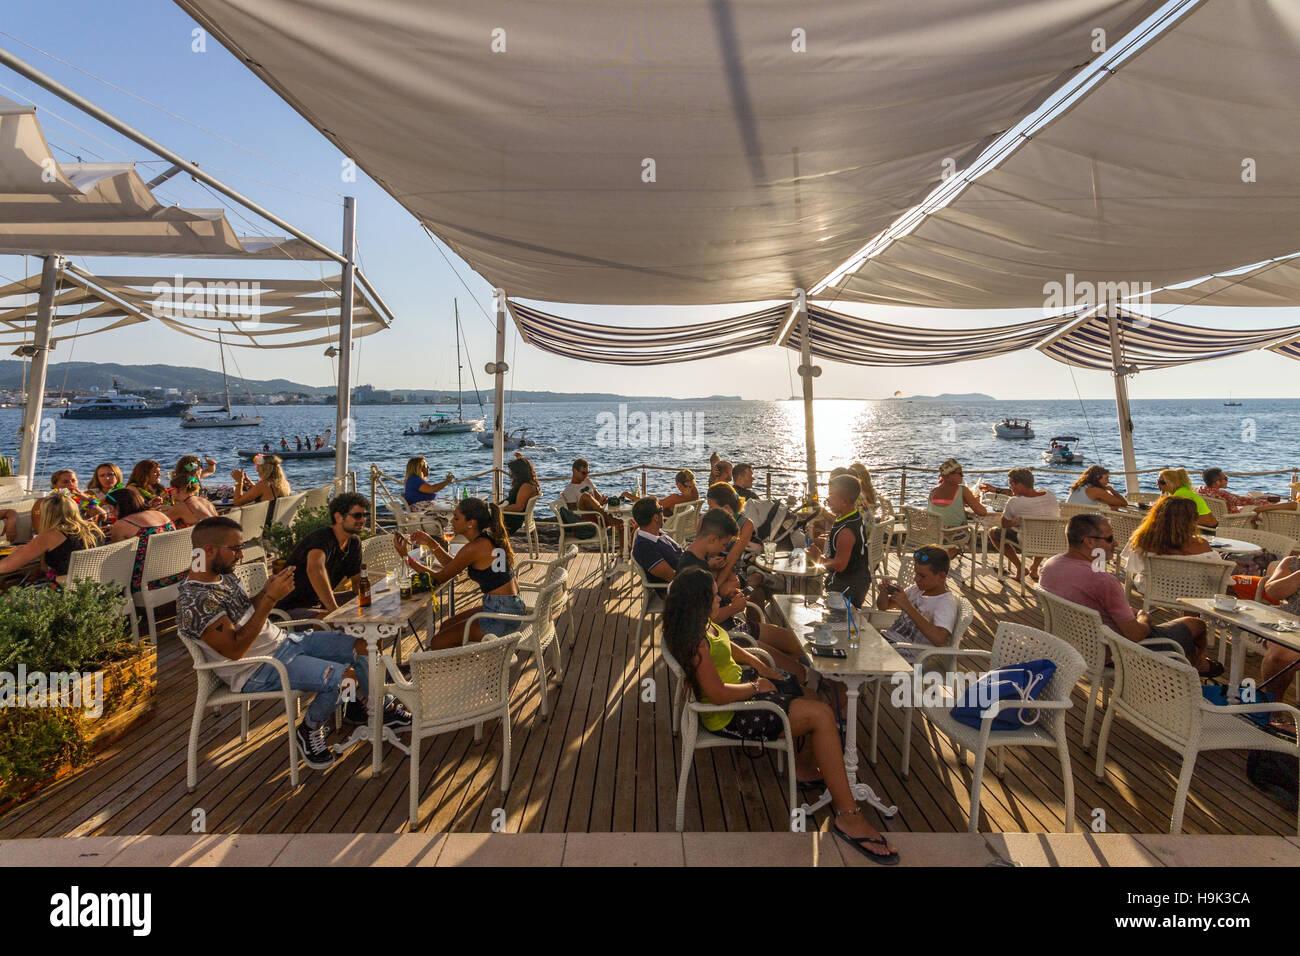 Spain, Balearic Islands, Ibiza, Sant Antoni de Portmany, people at Cafè del Mar - Stock Image